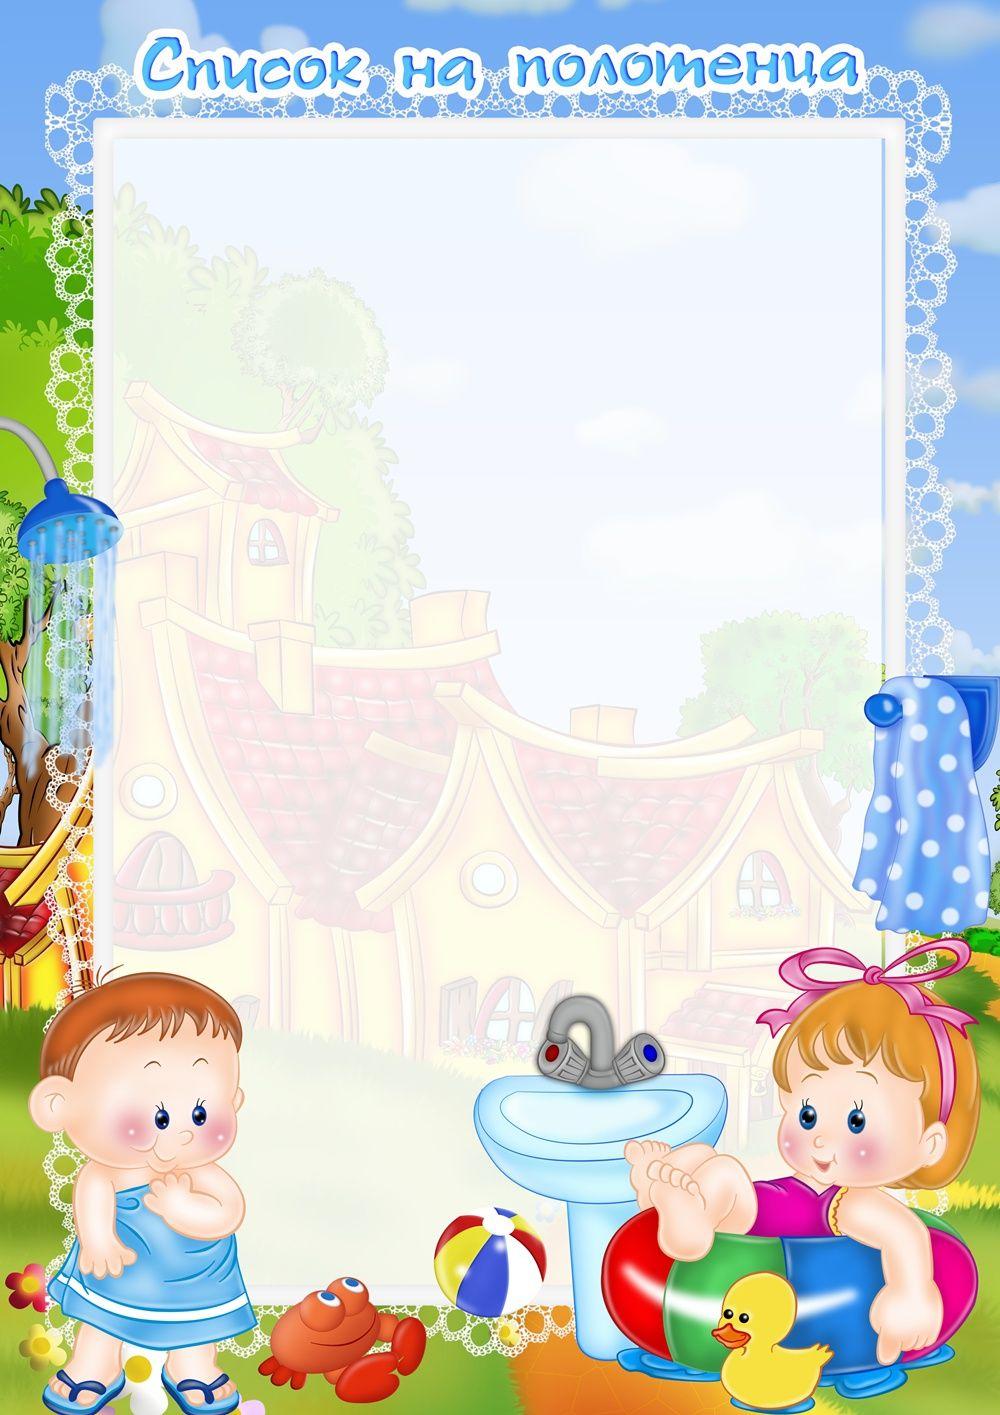 Картинки списков на полотенца для детского сада (13 фото ...